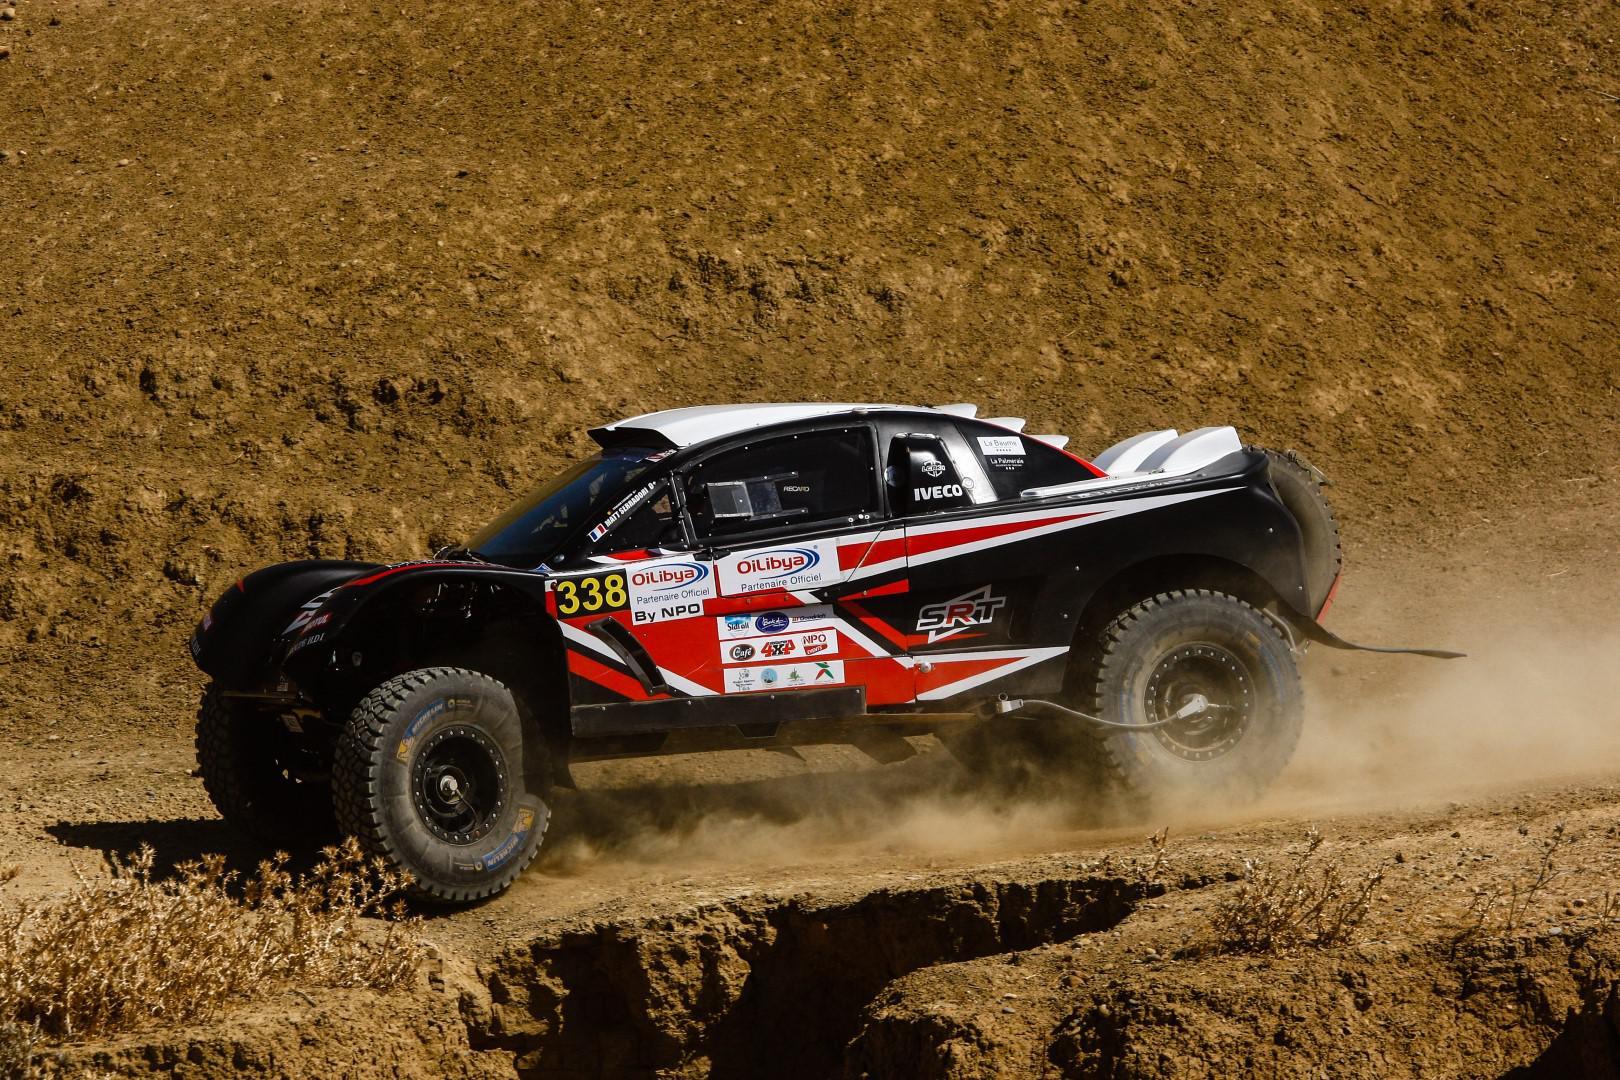 serradori-racing-team-rallye-oilibya-du-maroc-a-une-seconde-de-loeb-433-3.jpg